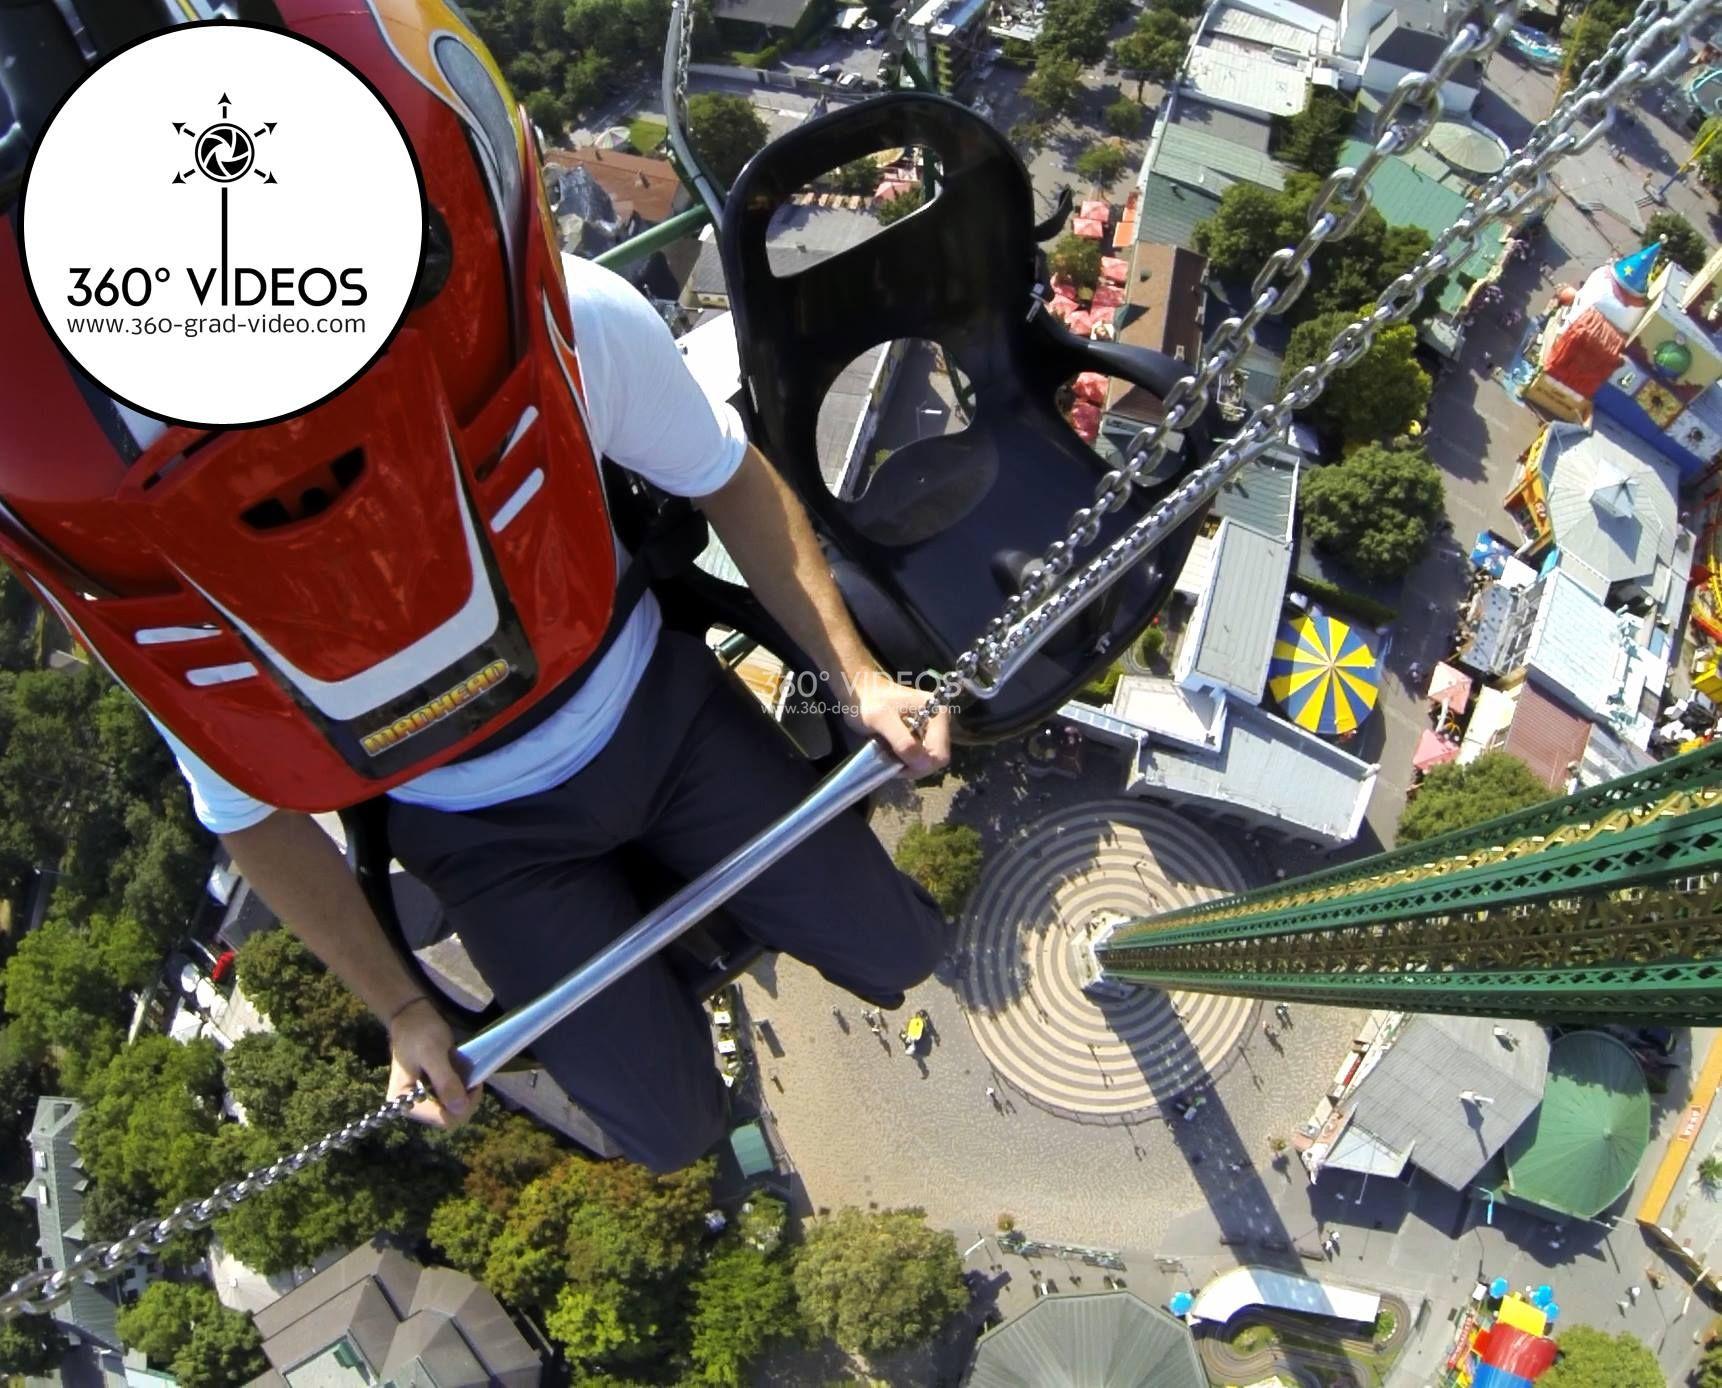 360 degree camera rollercoaster